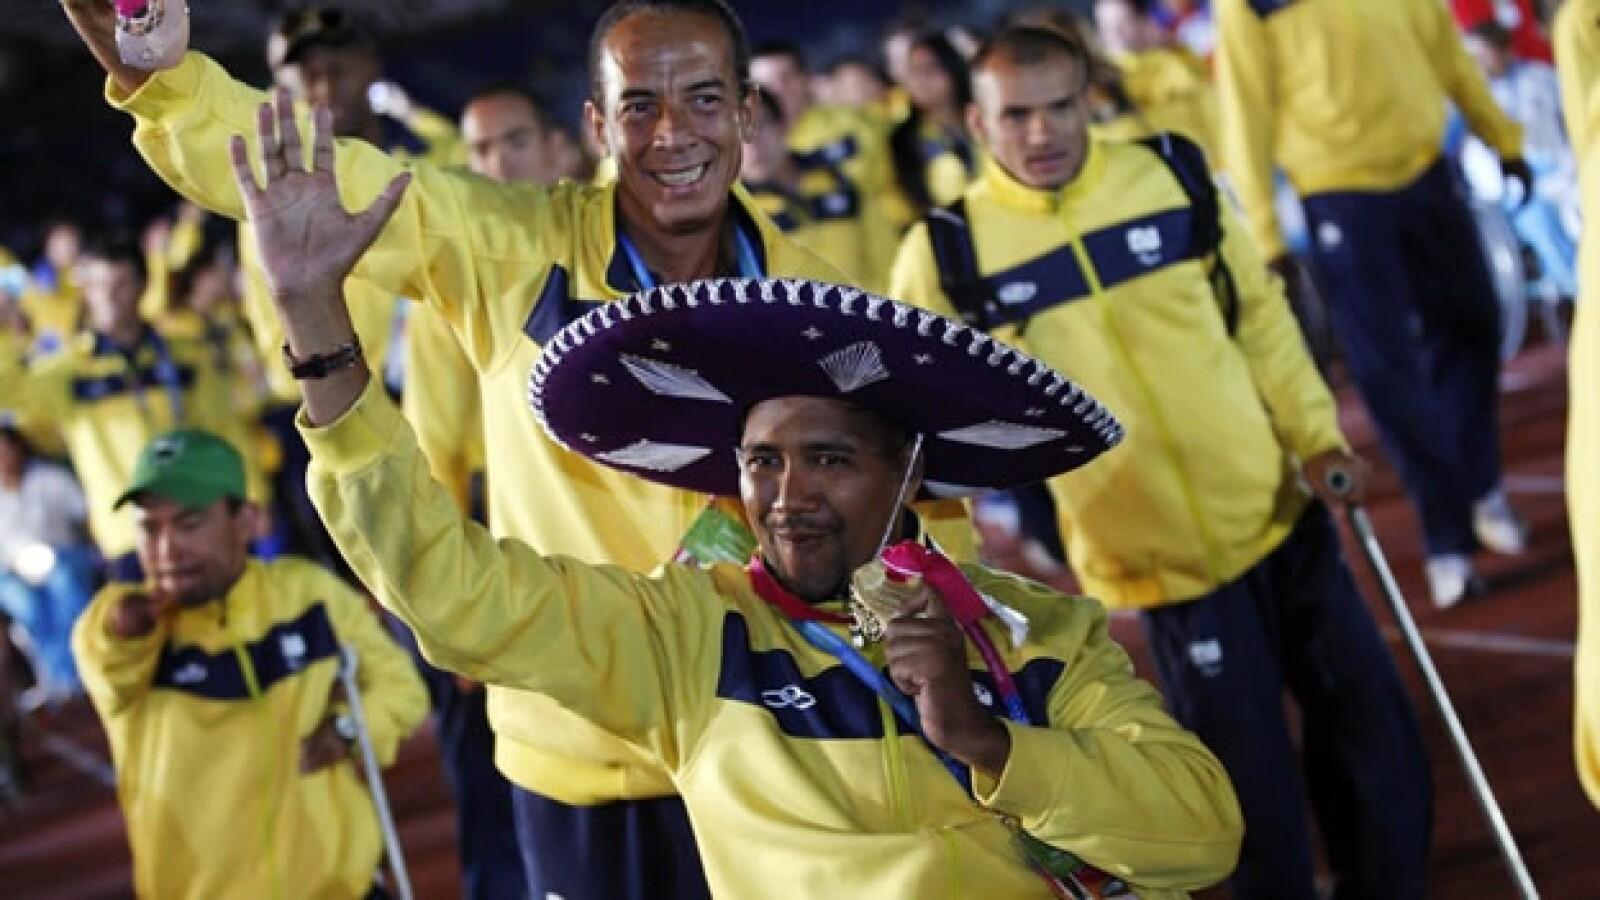 parapanamericanos guadalajara 2011 jalisco clausura